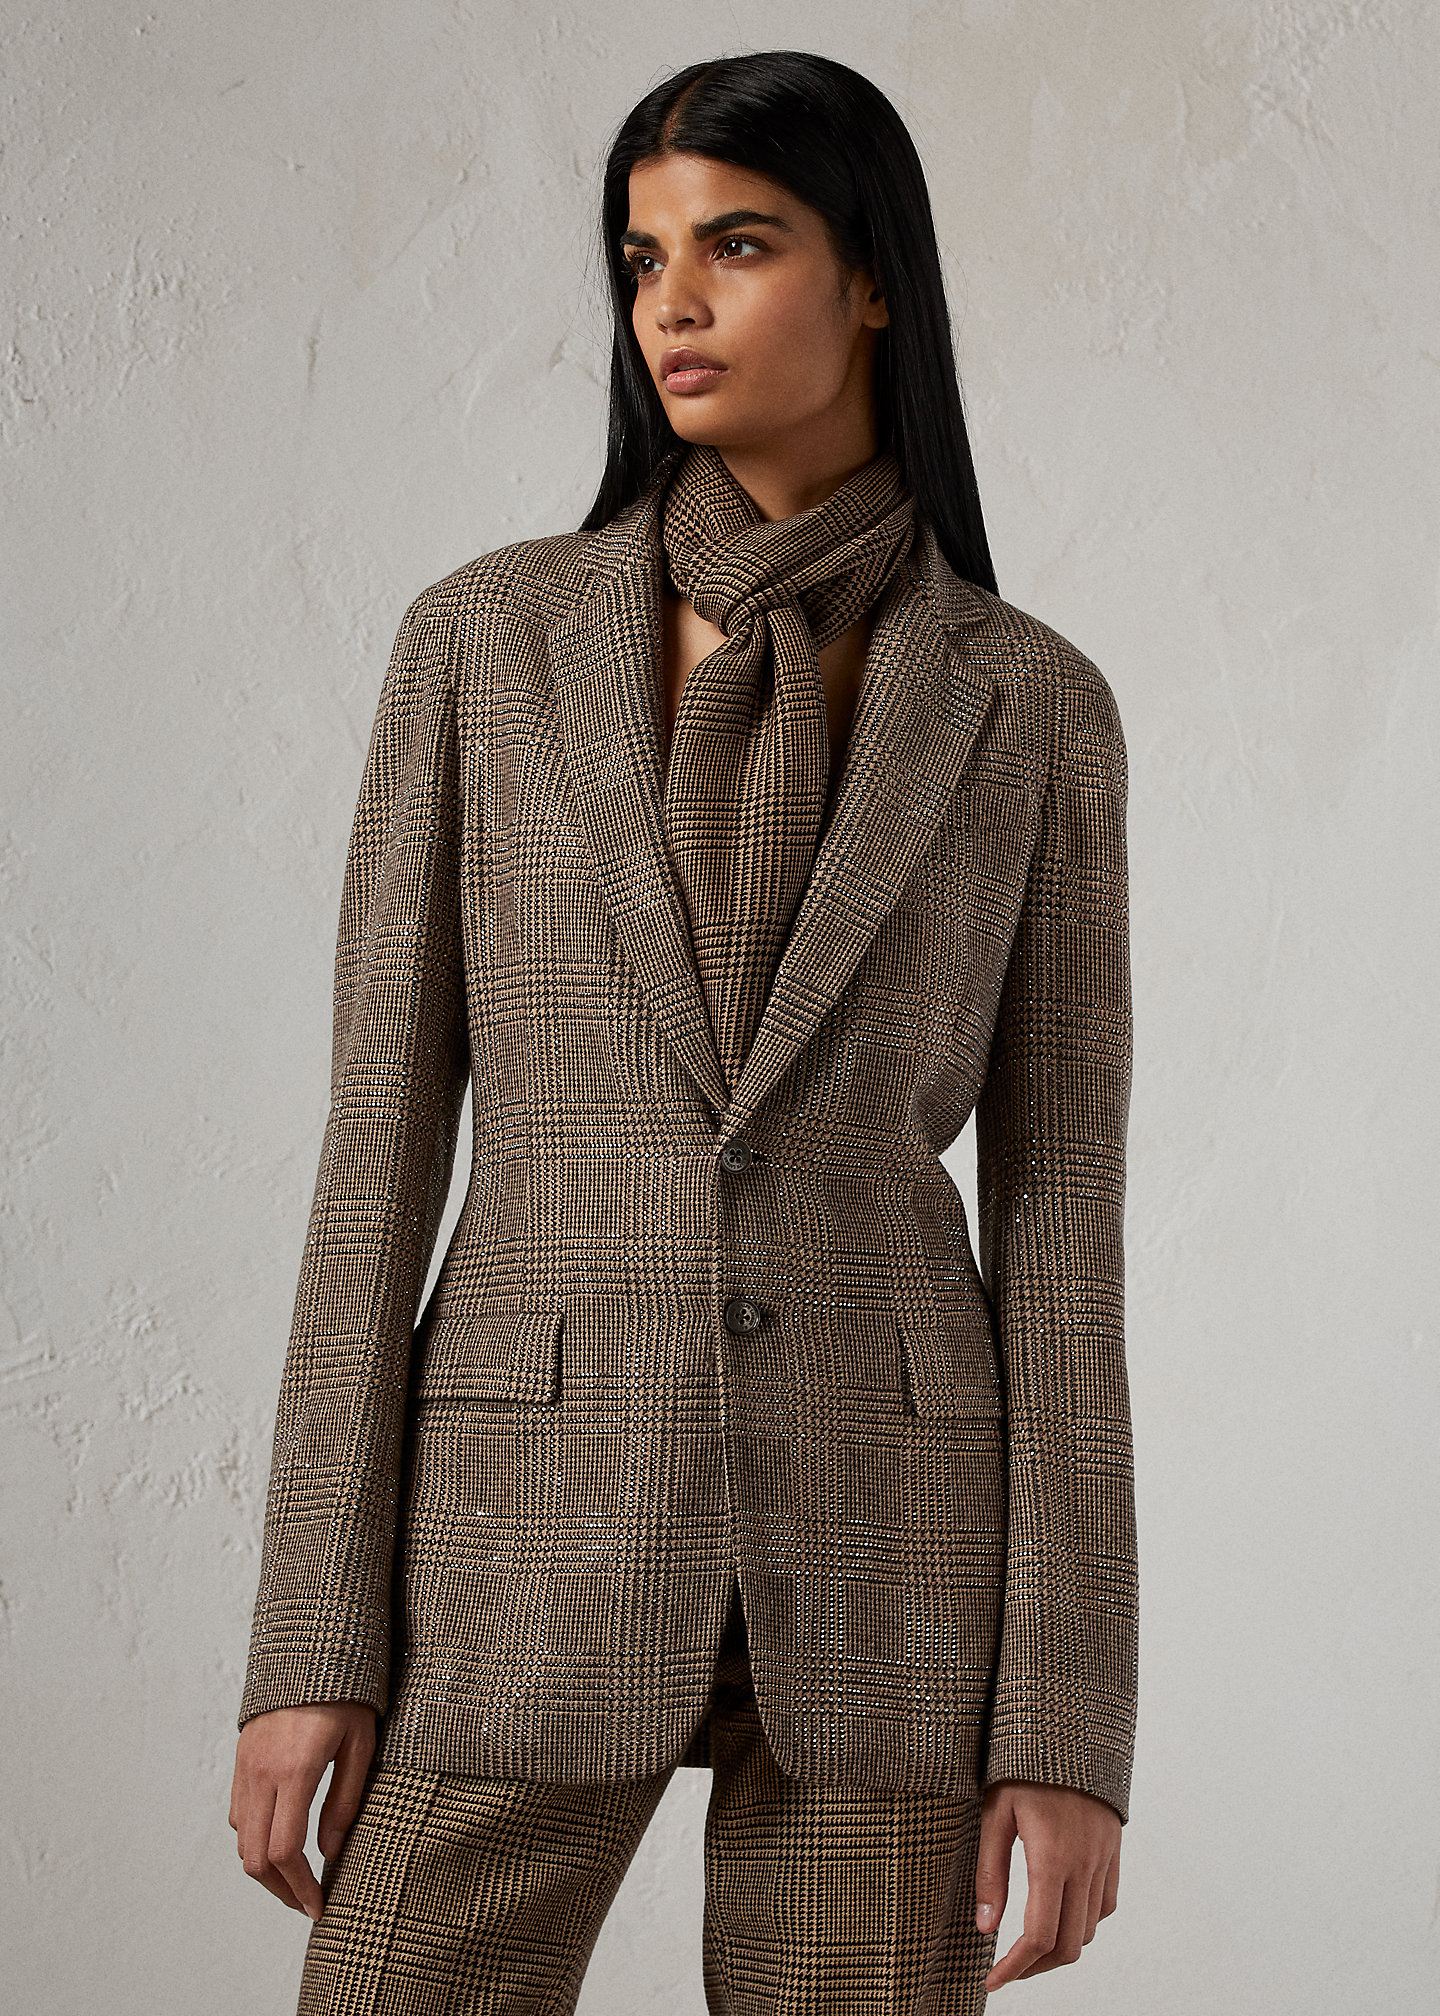 Ralph Lauren Collection Randall Embellished Wool-Blend Jacket 1